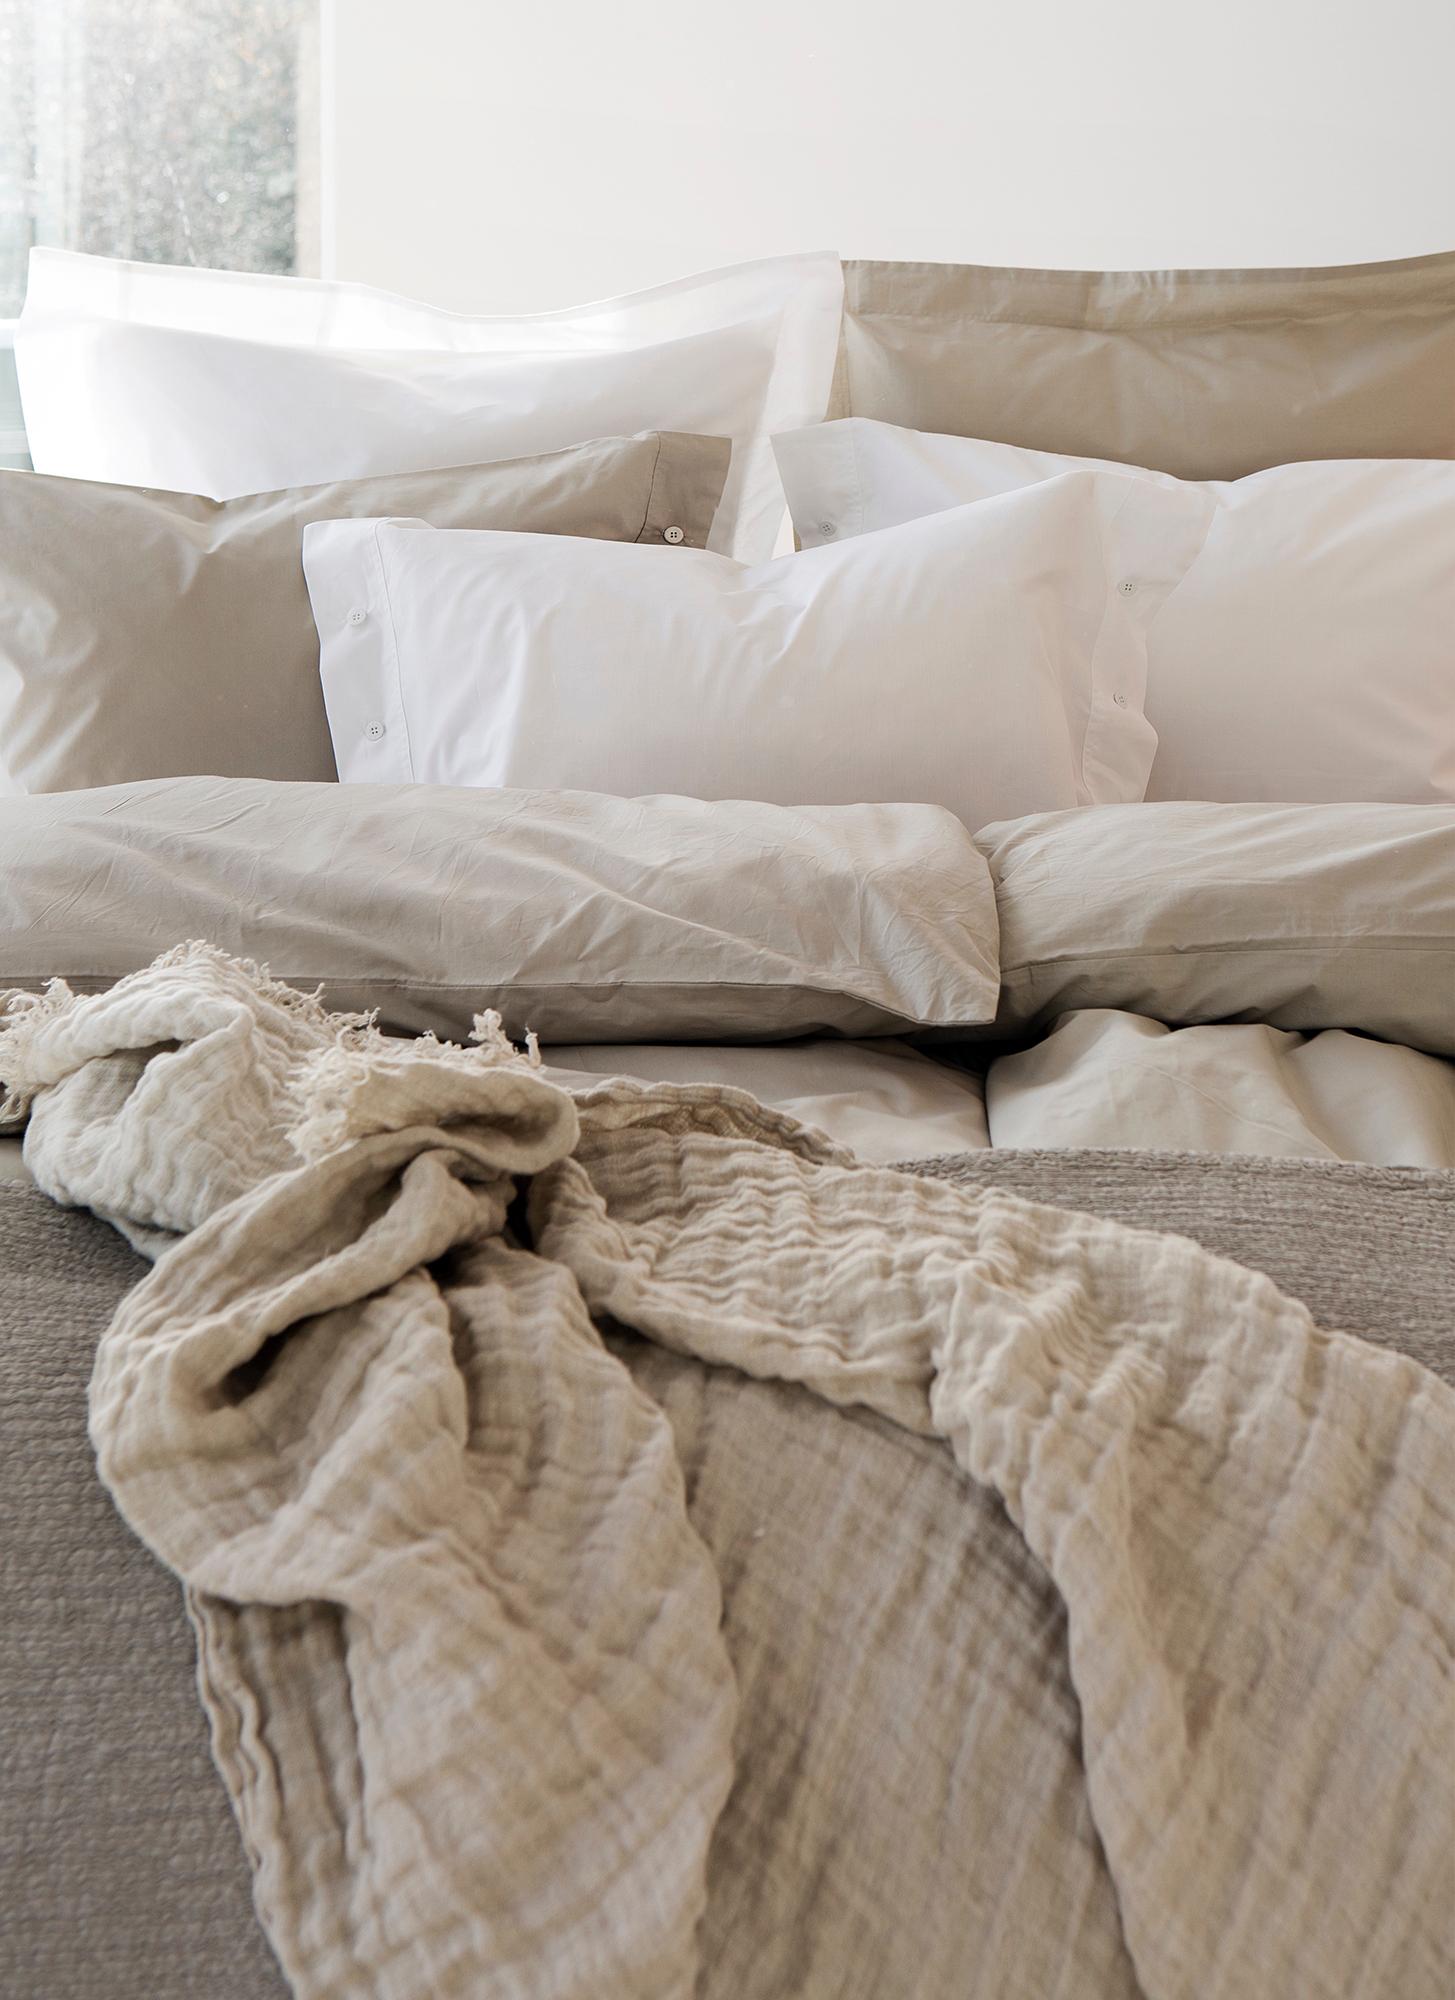 himla_bed_drottningholm-bedlinen-aluminium_cornelia-bedspread-opal_hannelin-throw-naturalwhite_S_2.jpg